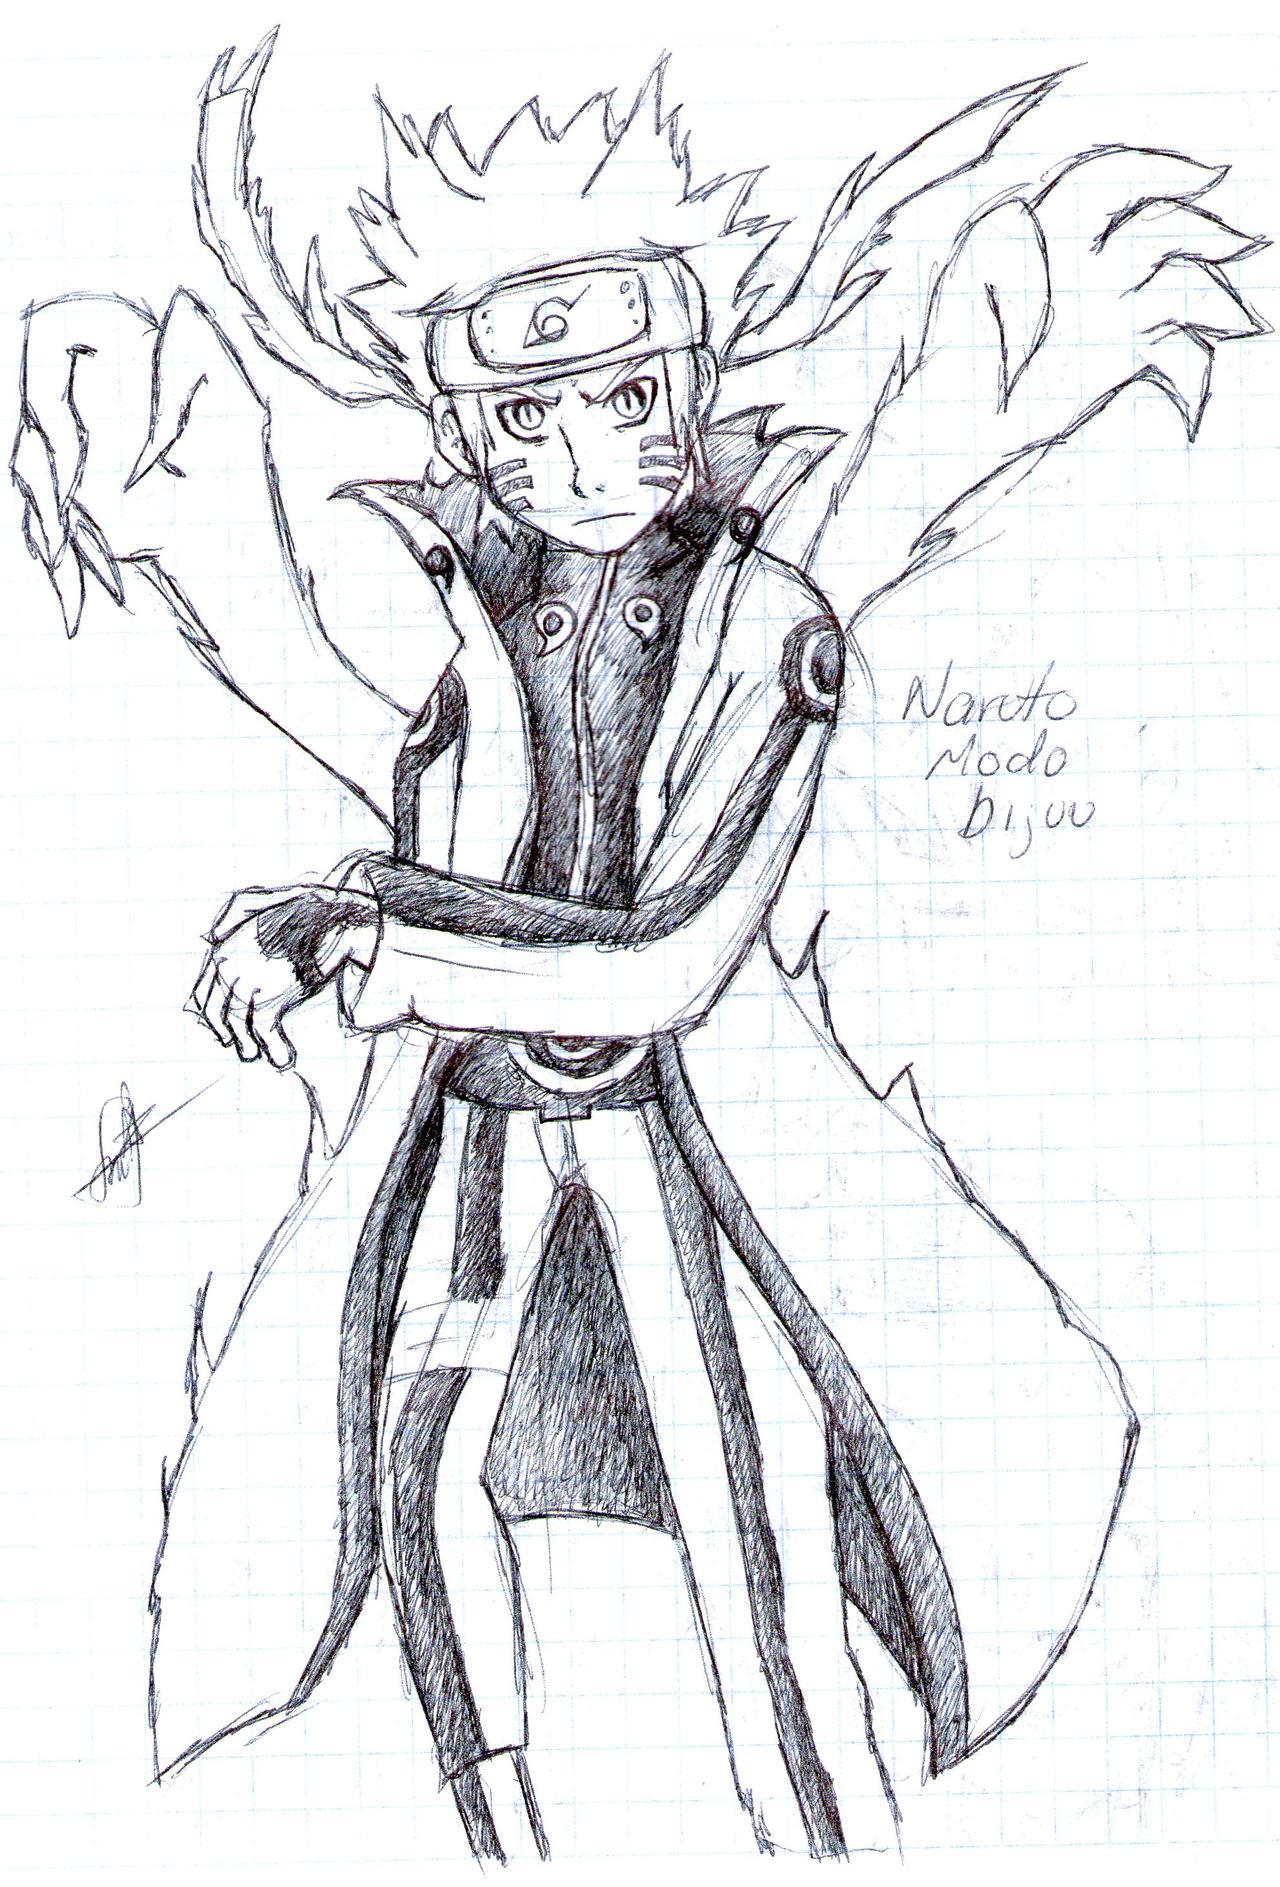 Naruto Bijuu mode by leonarockera on DeviantArt